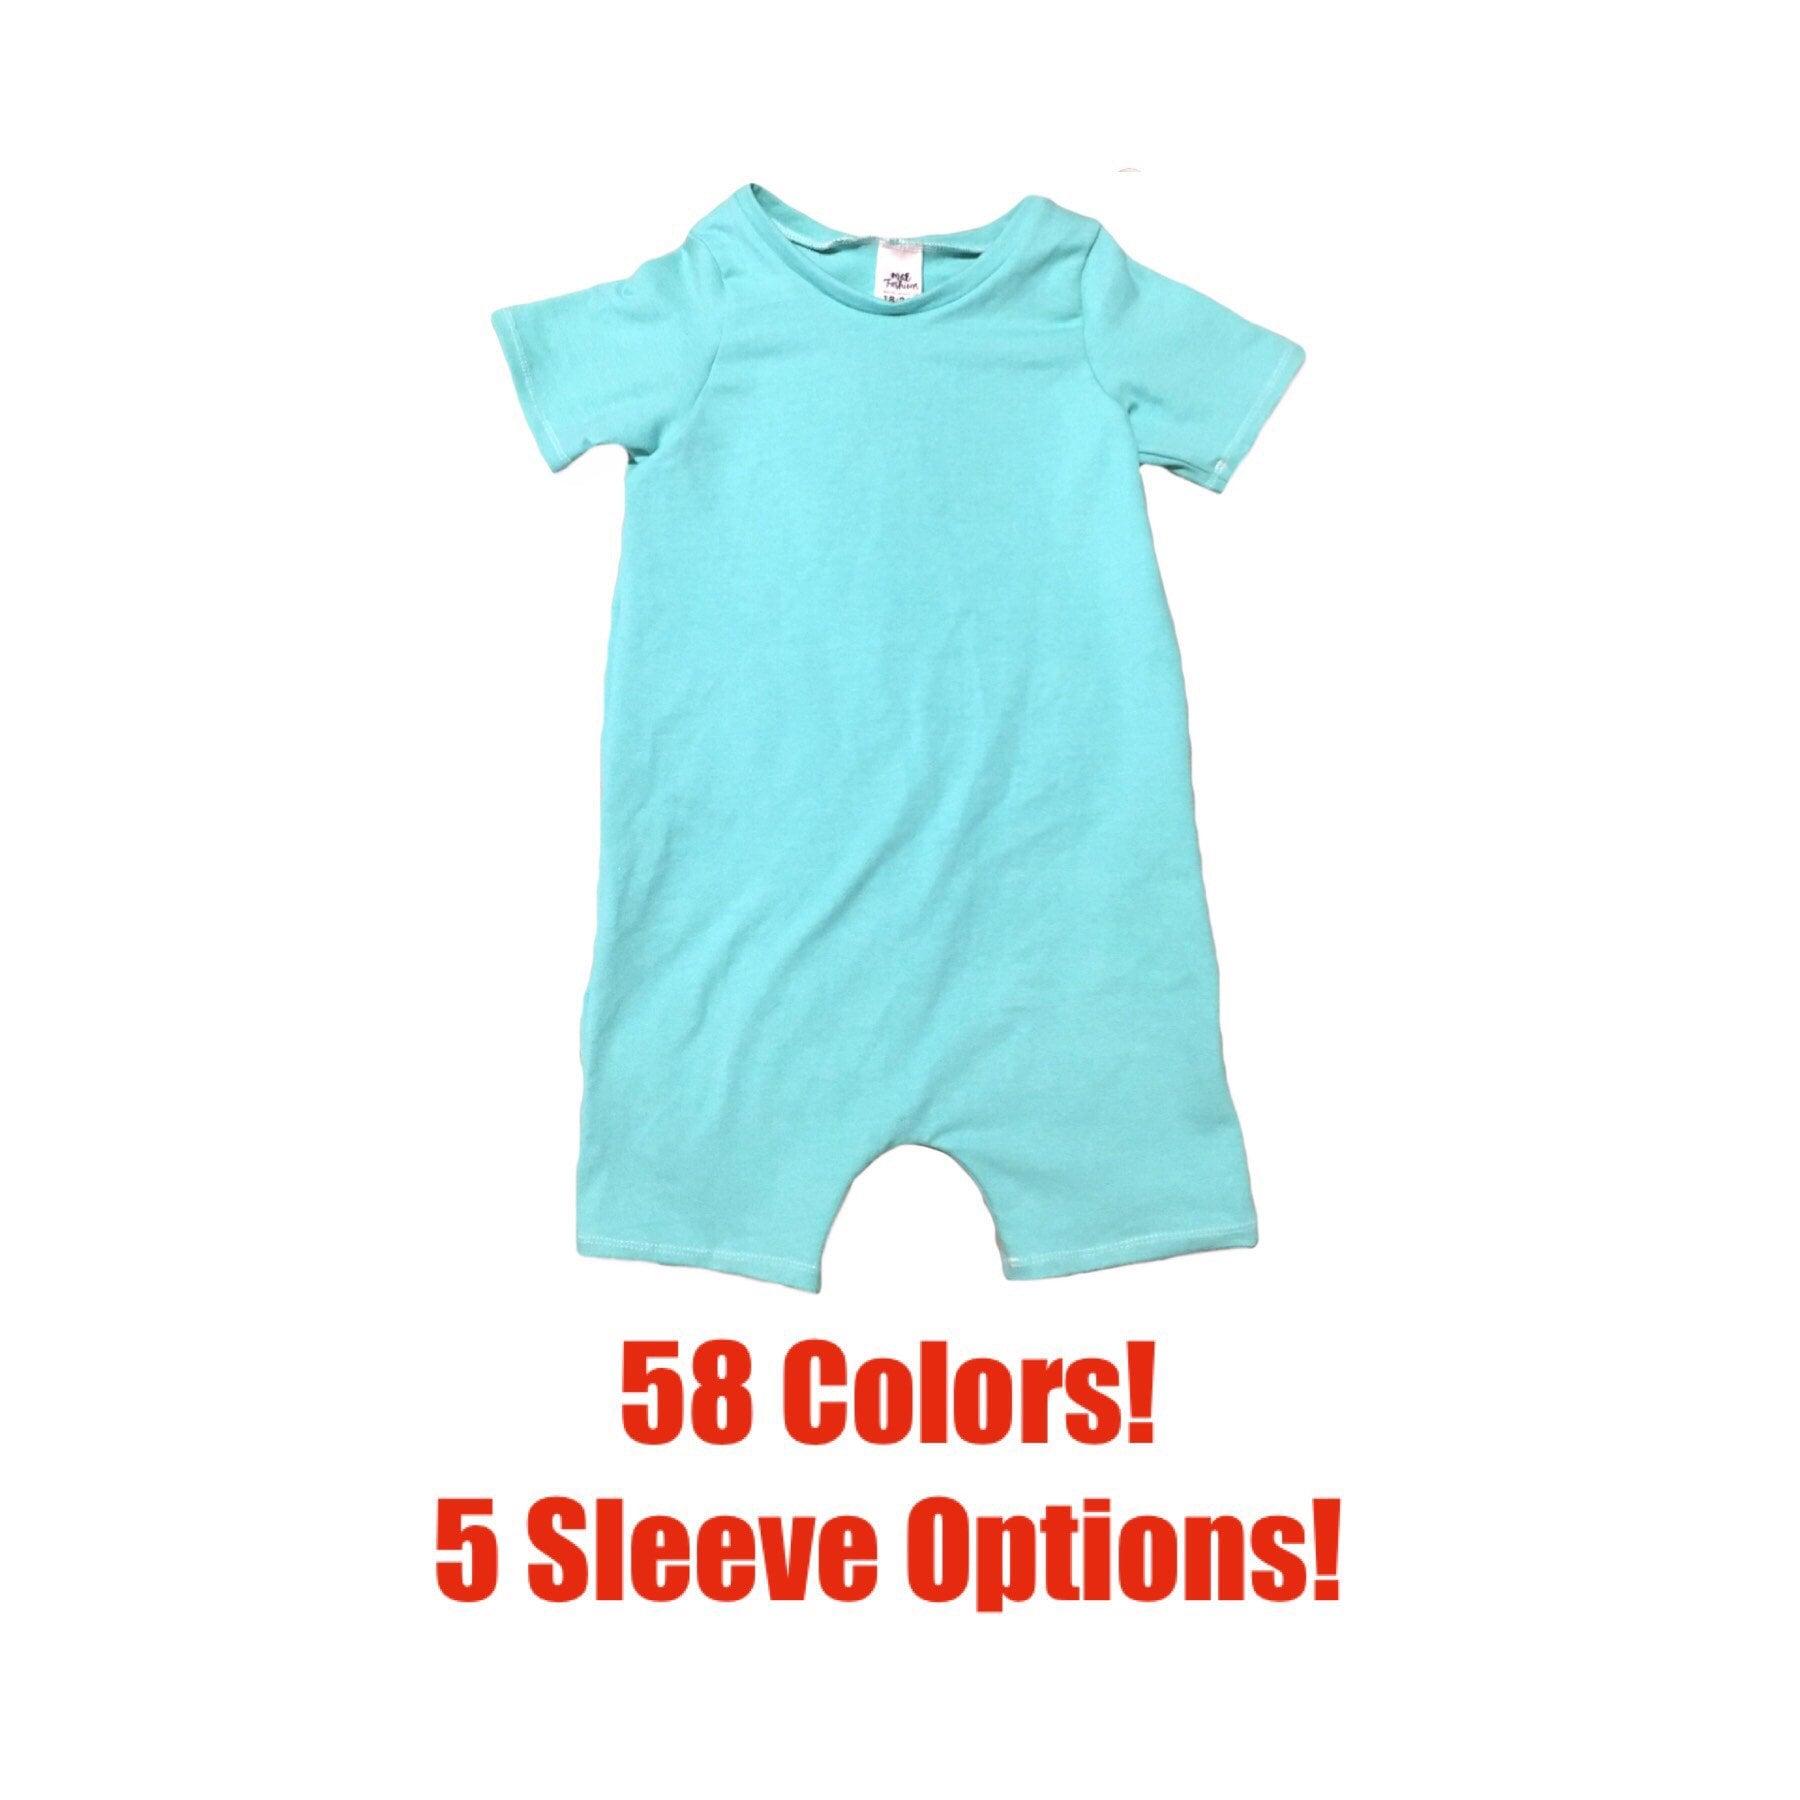 e51354044b94 Solid Short Romper Toddler Romper Solid Romper Baby